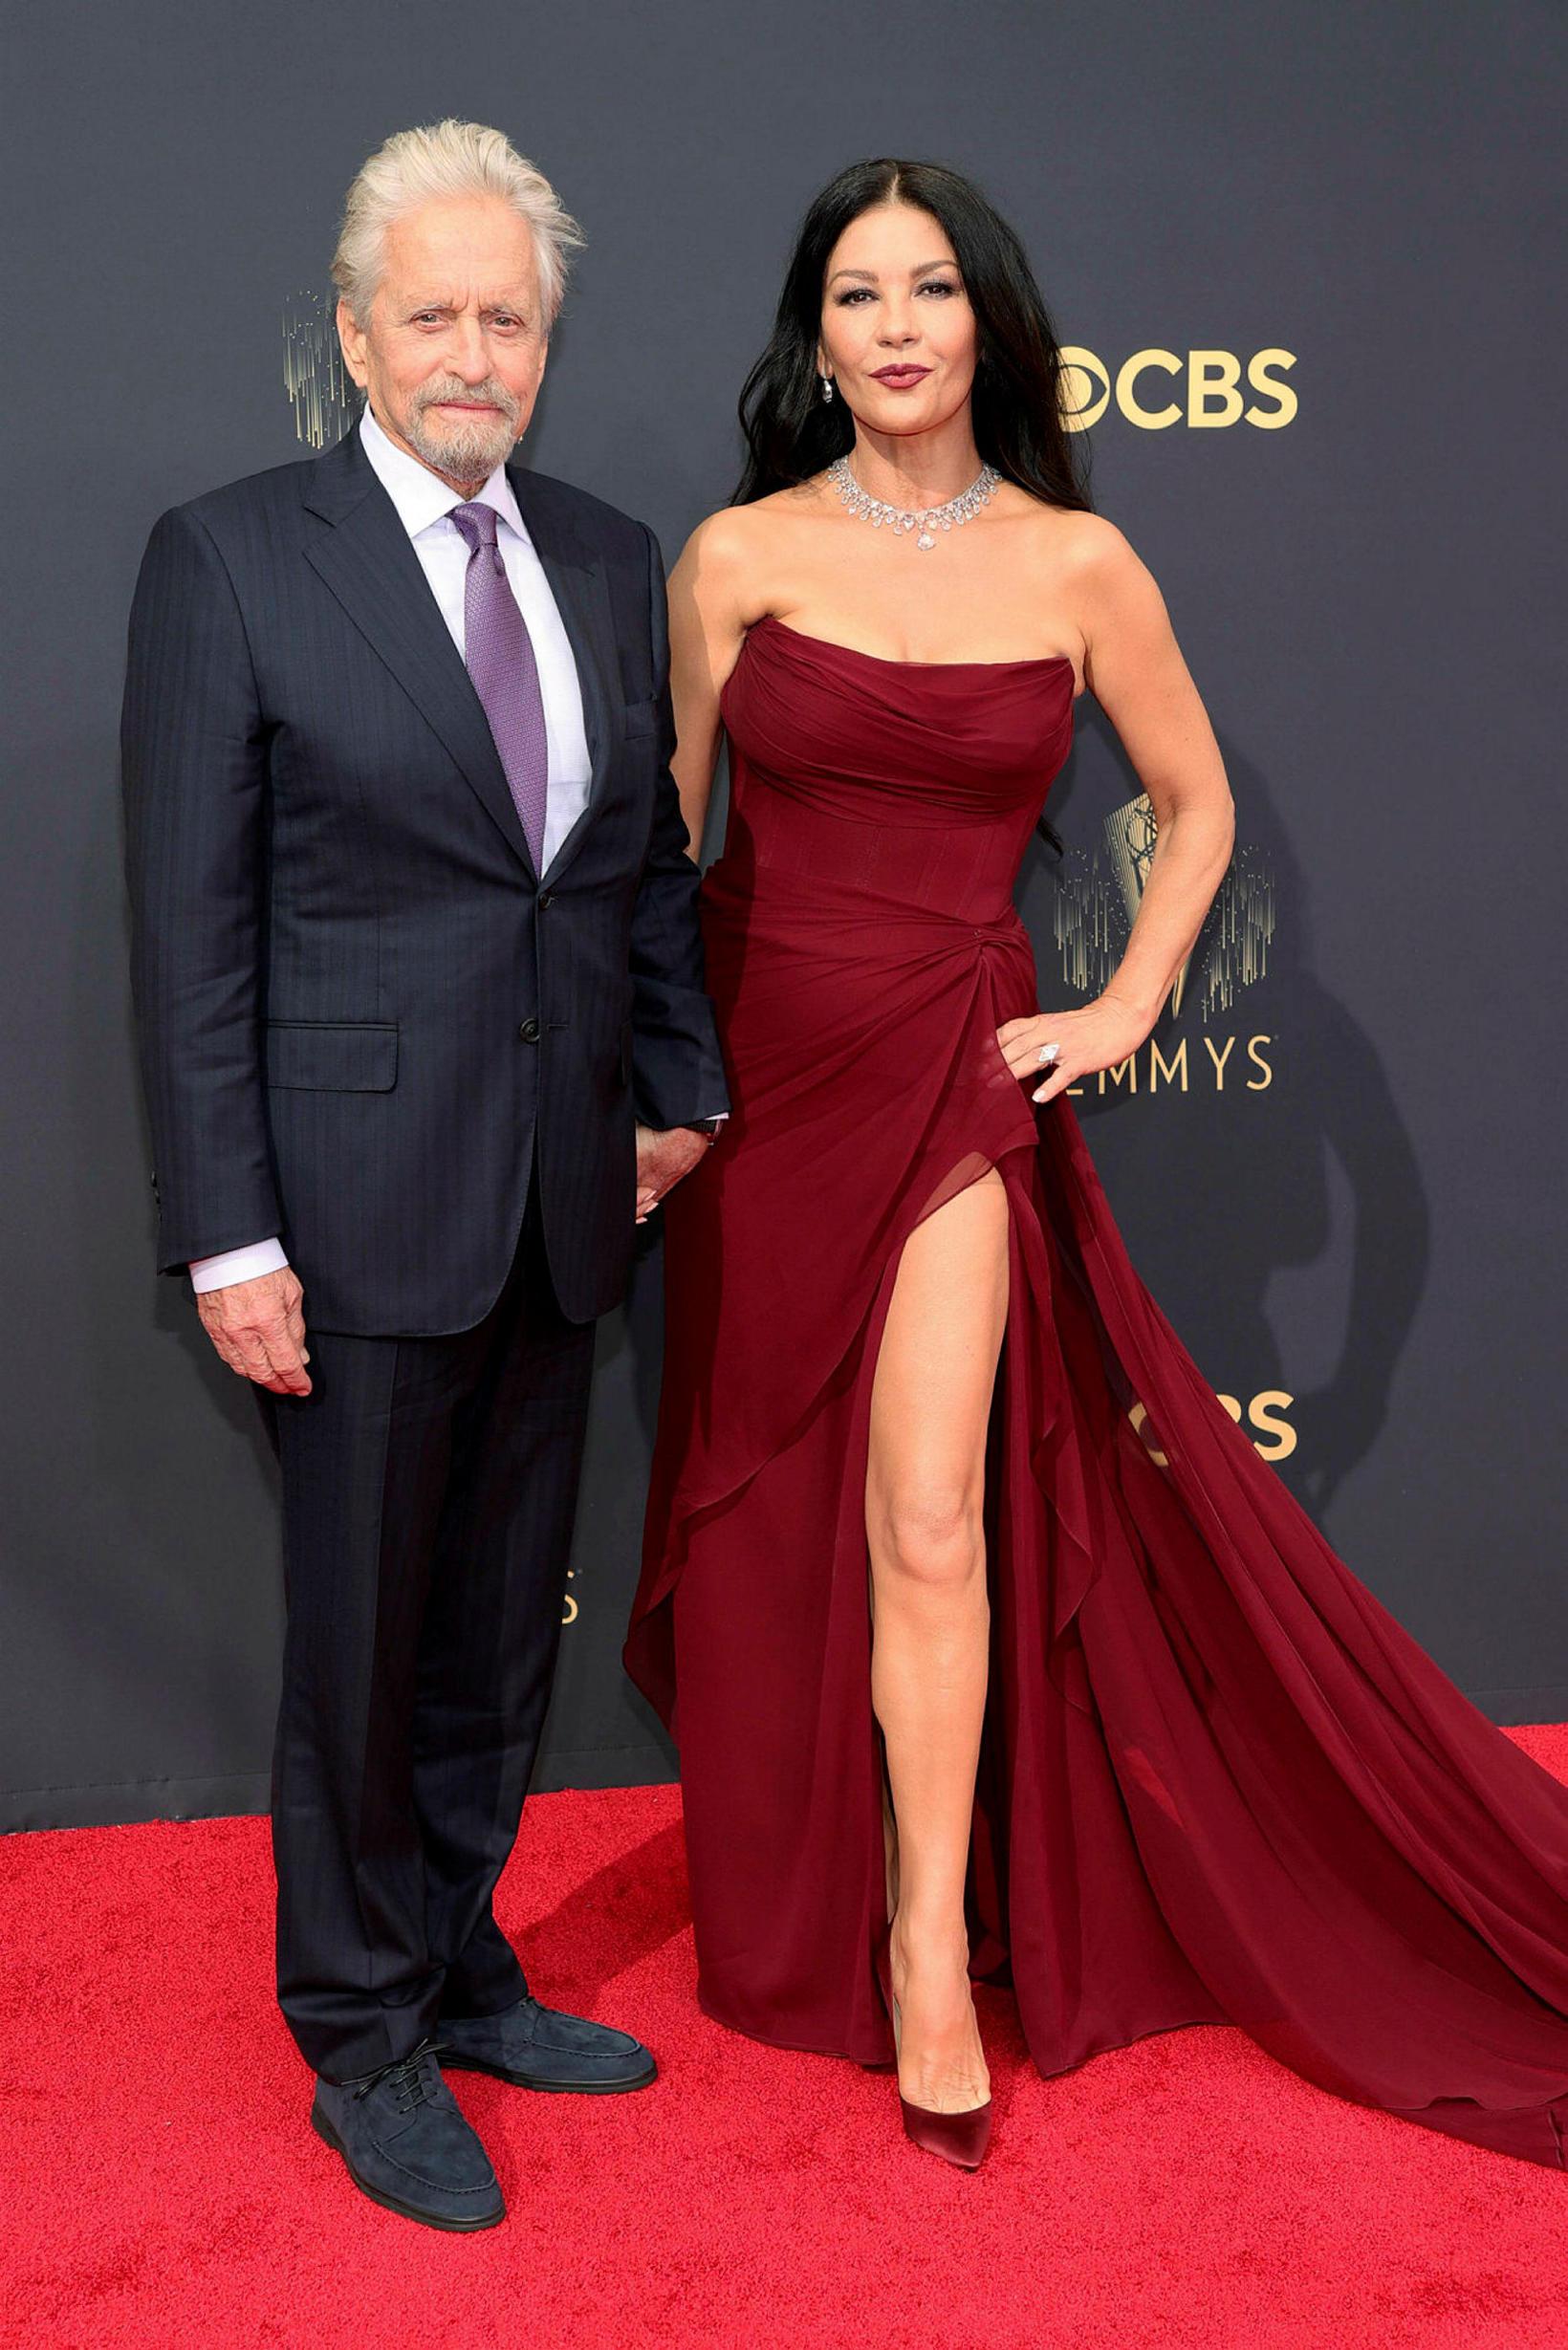 Leikarahjónin Michael Douglas og Catherine Zeta-Jones. Zeta-Jones klæddist kjól frá …